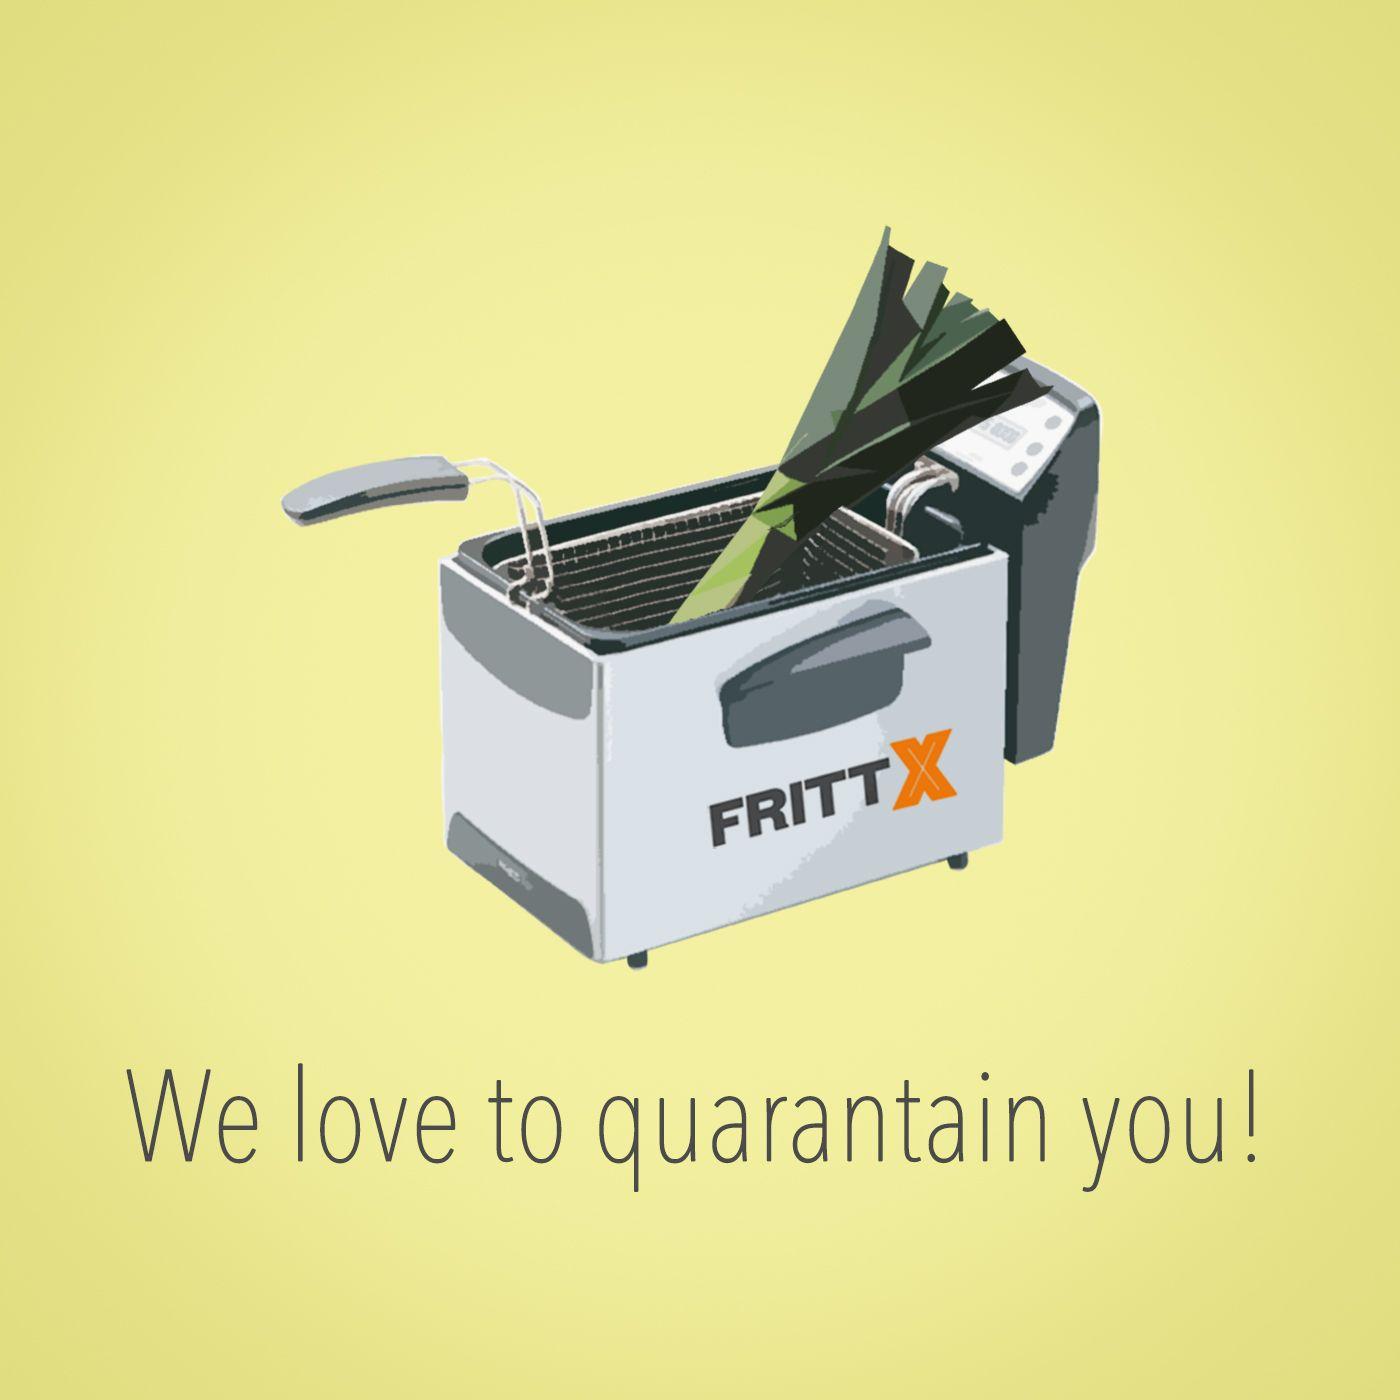 We love to quarantain you!